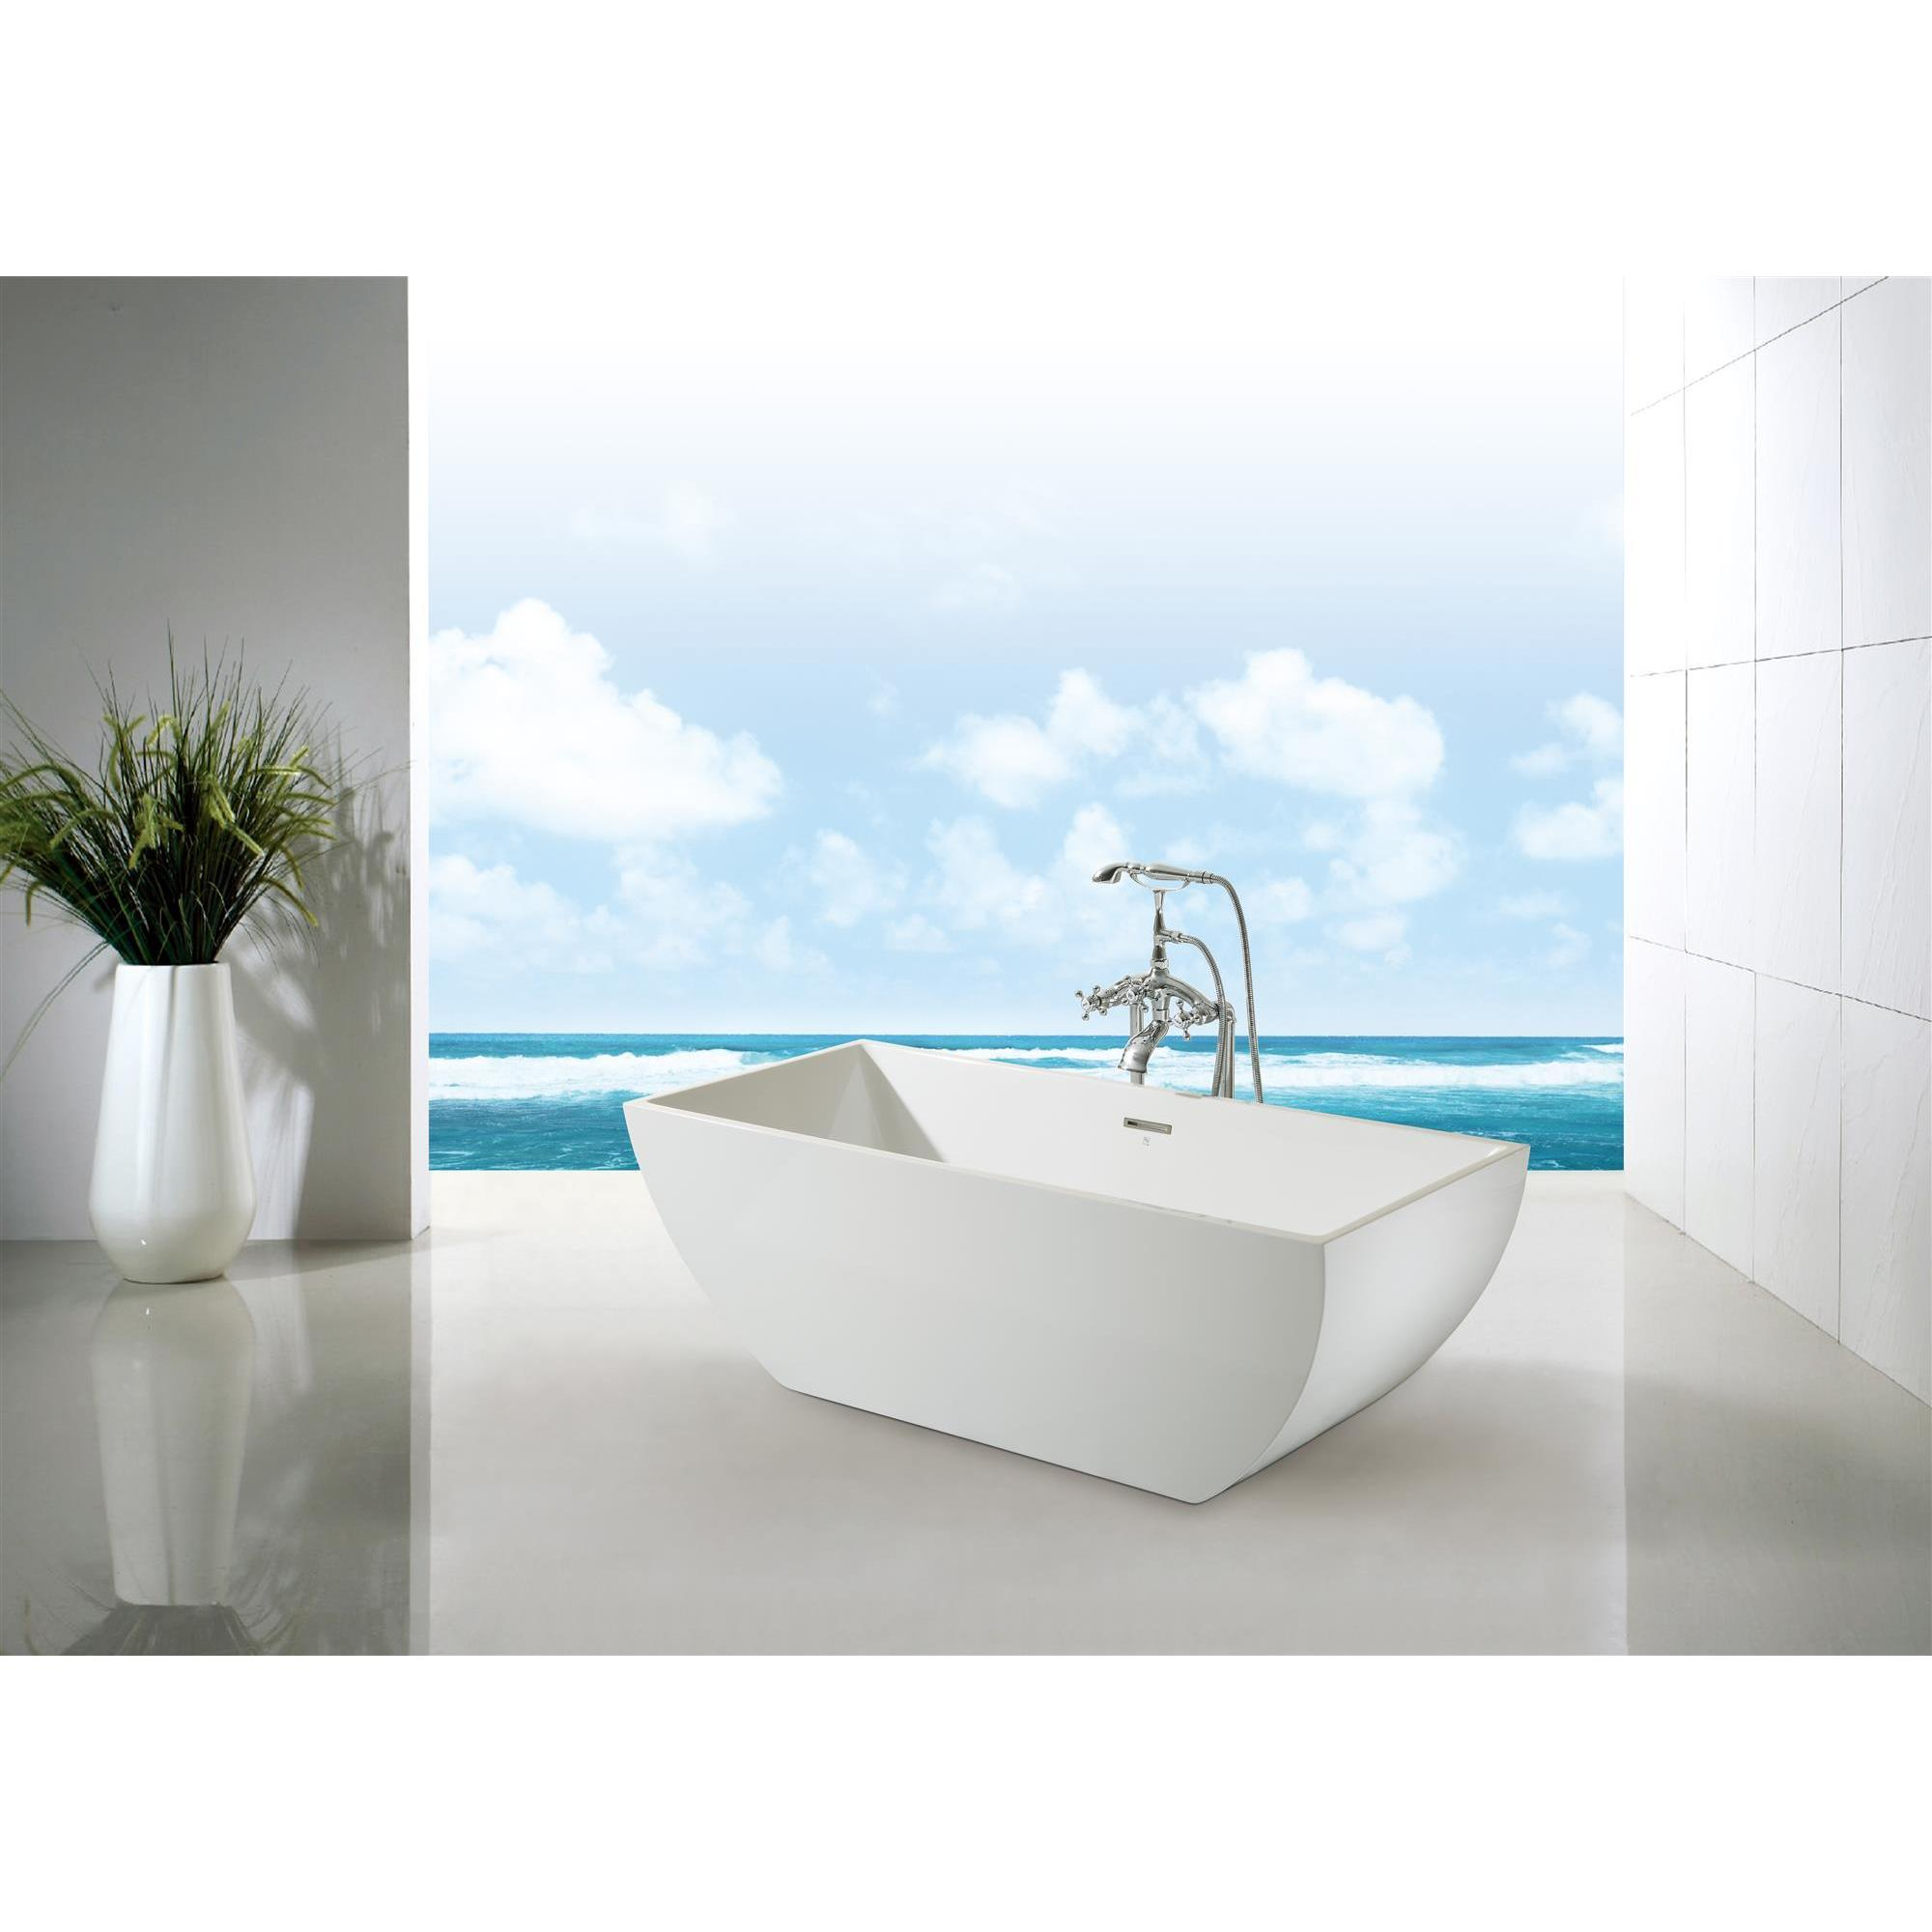 Ariel Platinum Chelsea White Acrylic 67-inch Rectangular Bathtub ...